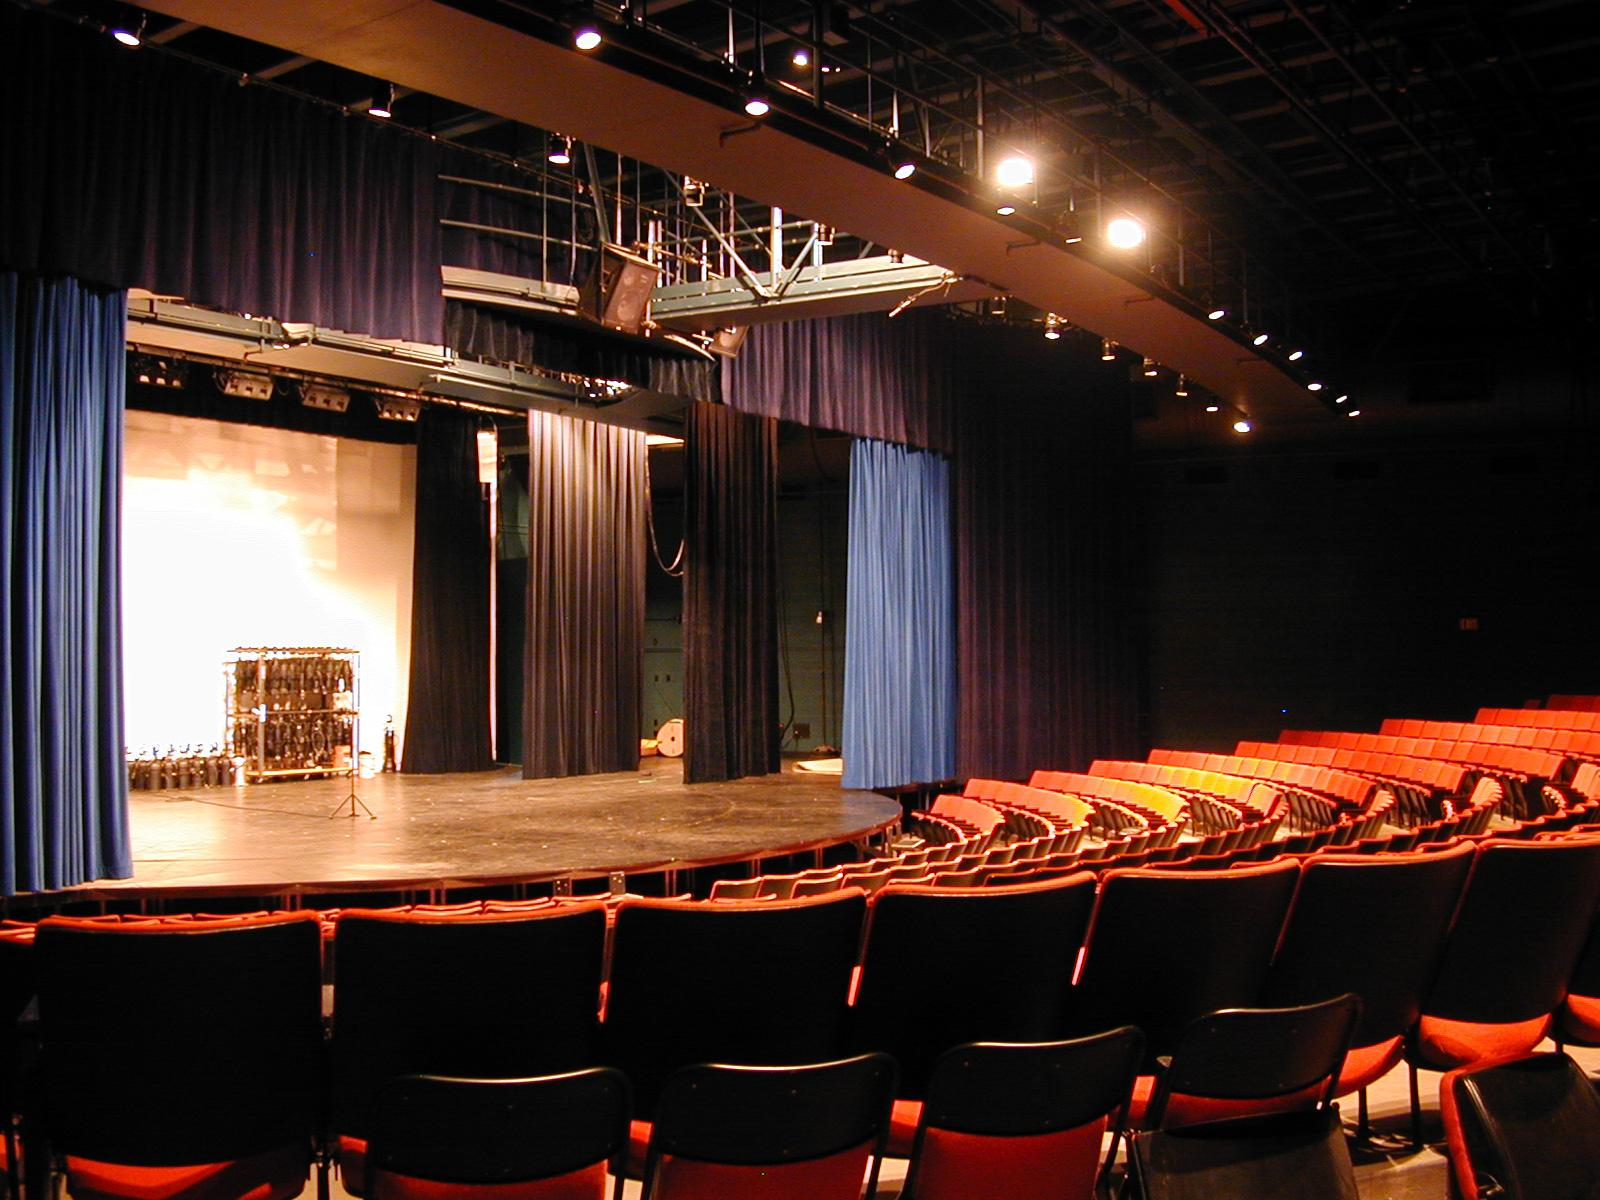 Roberts Theater